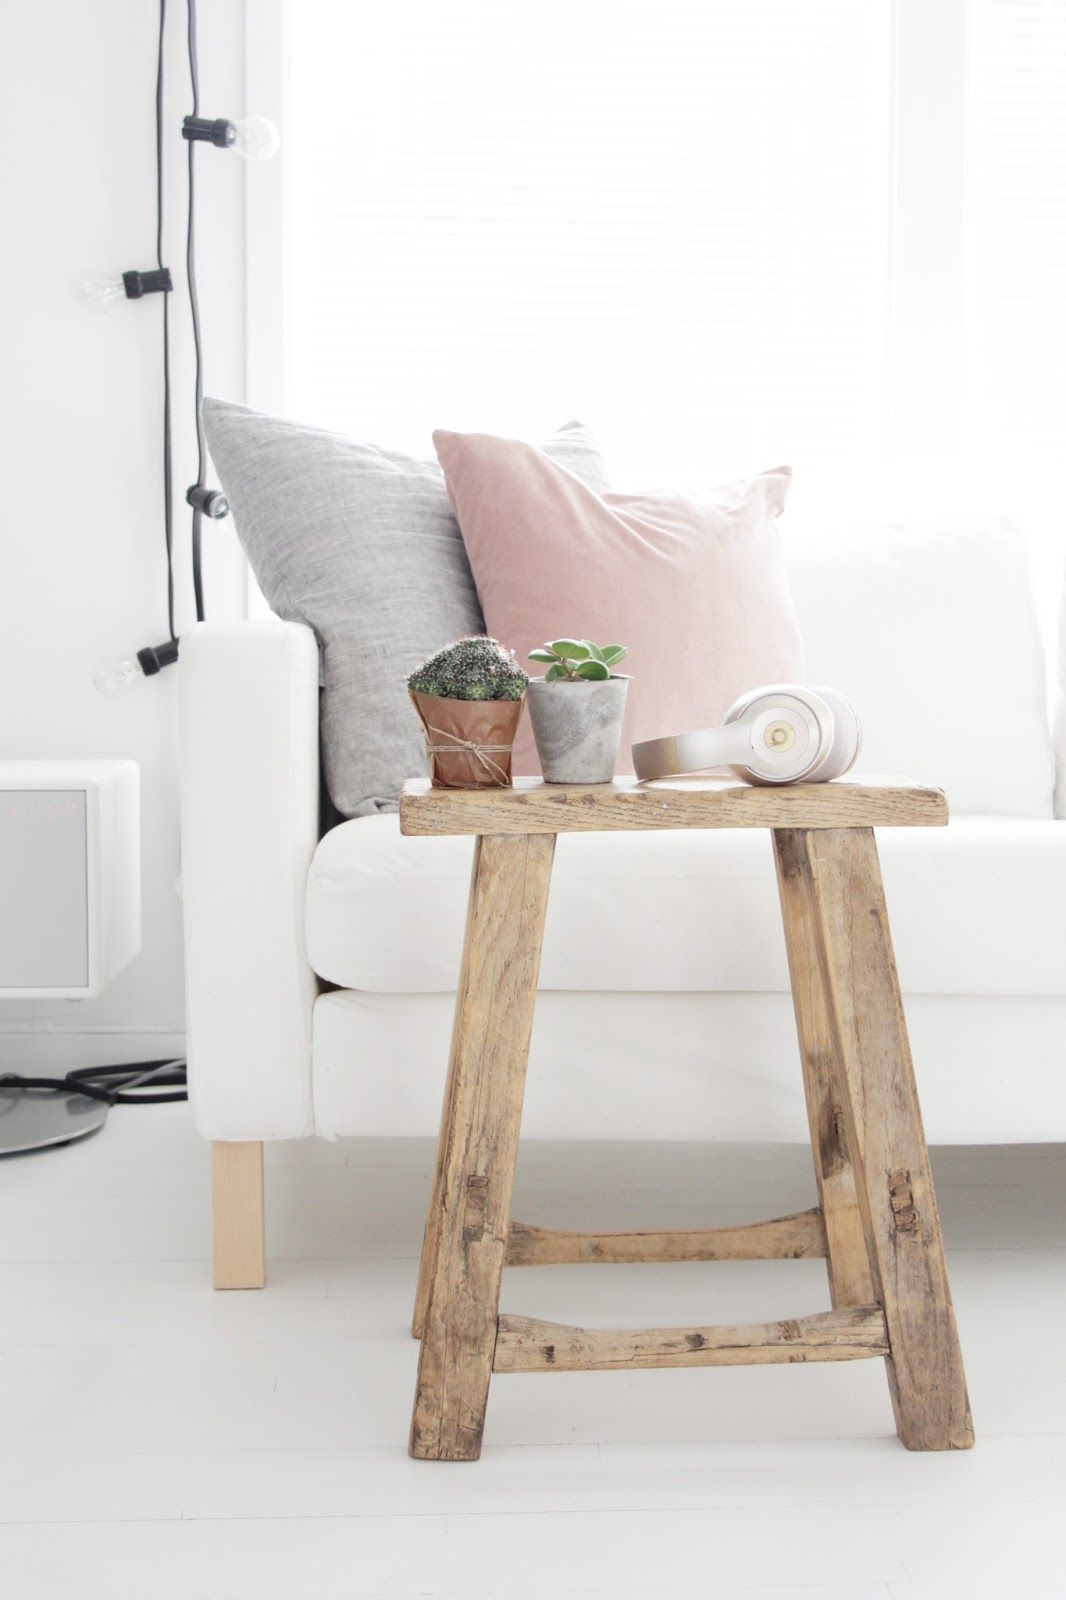 Decorate with Pillows www.noraquinonez.com @noraquinonez #Pillows #Cushions #Decor